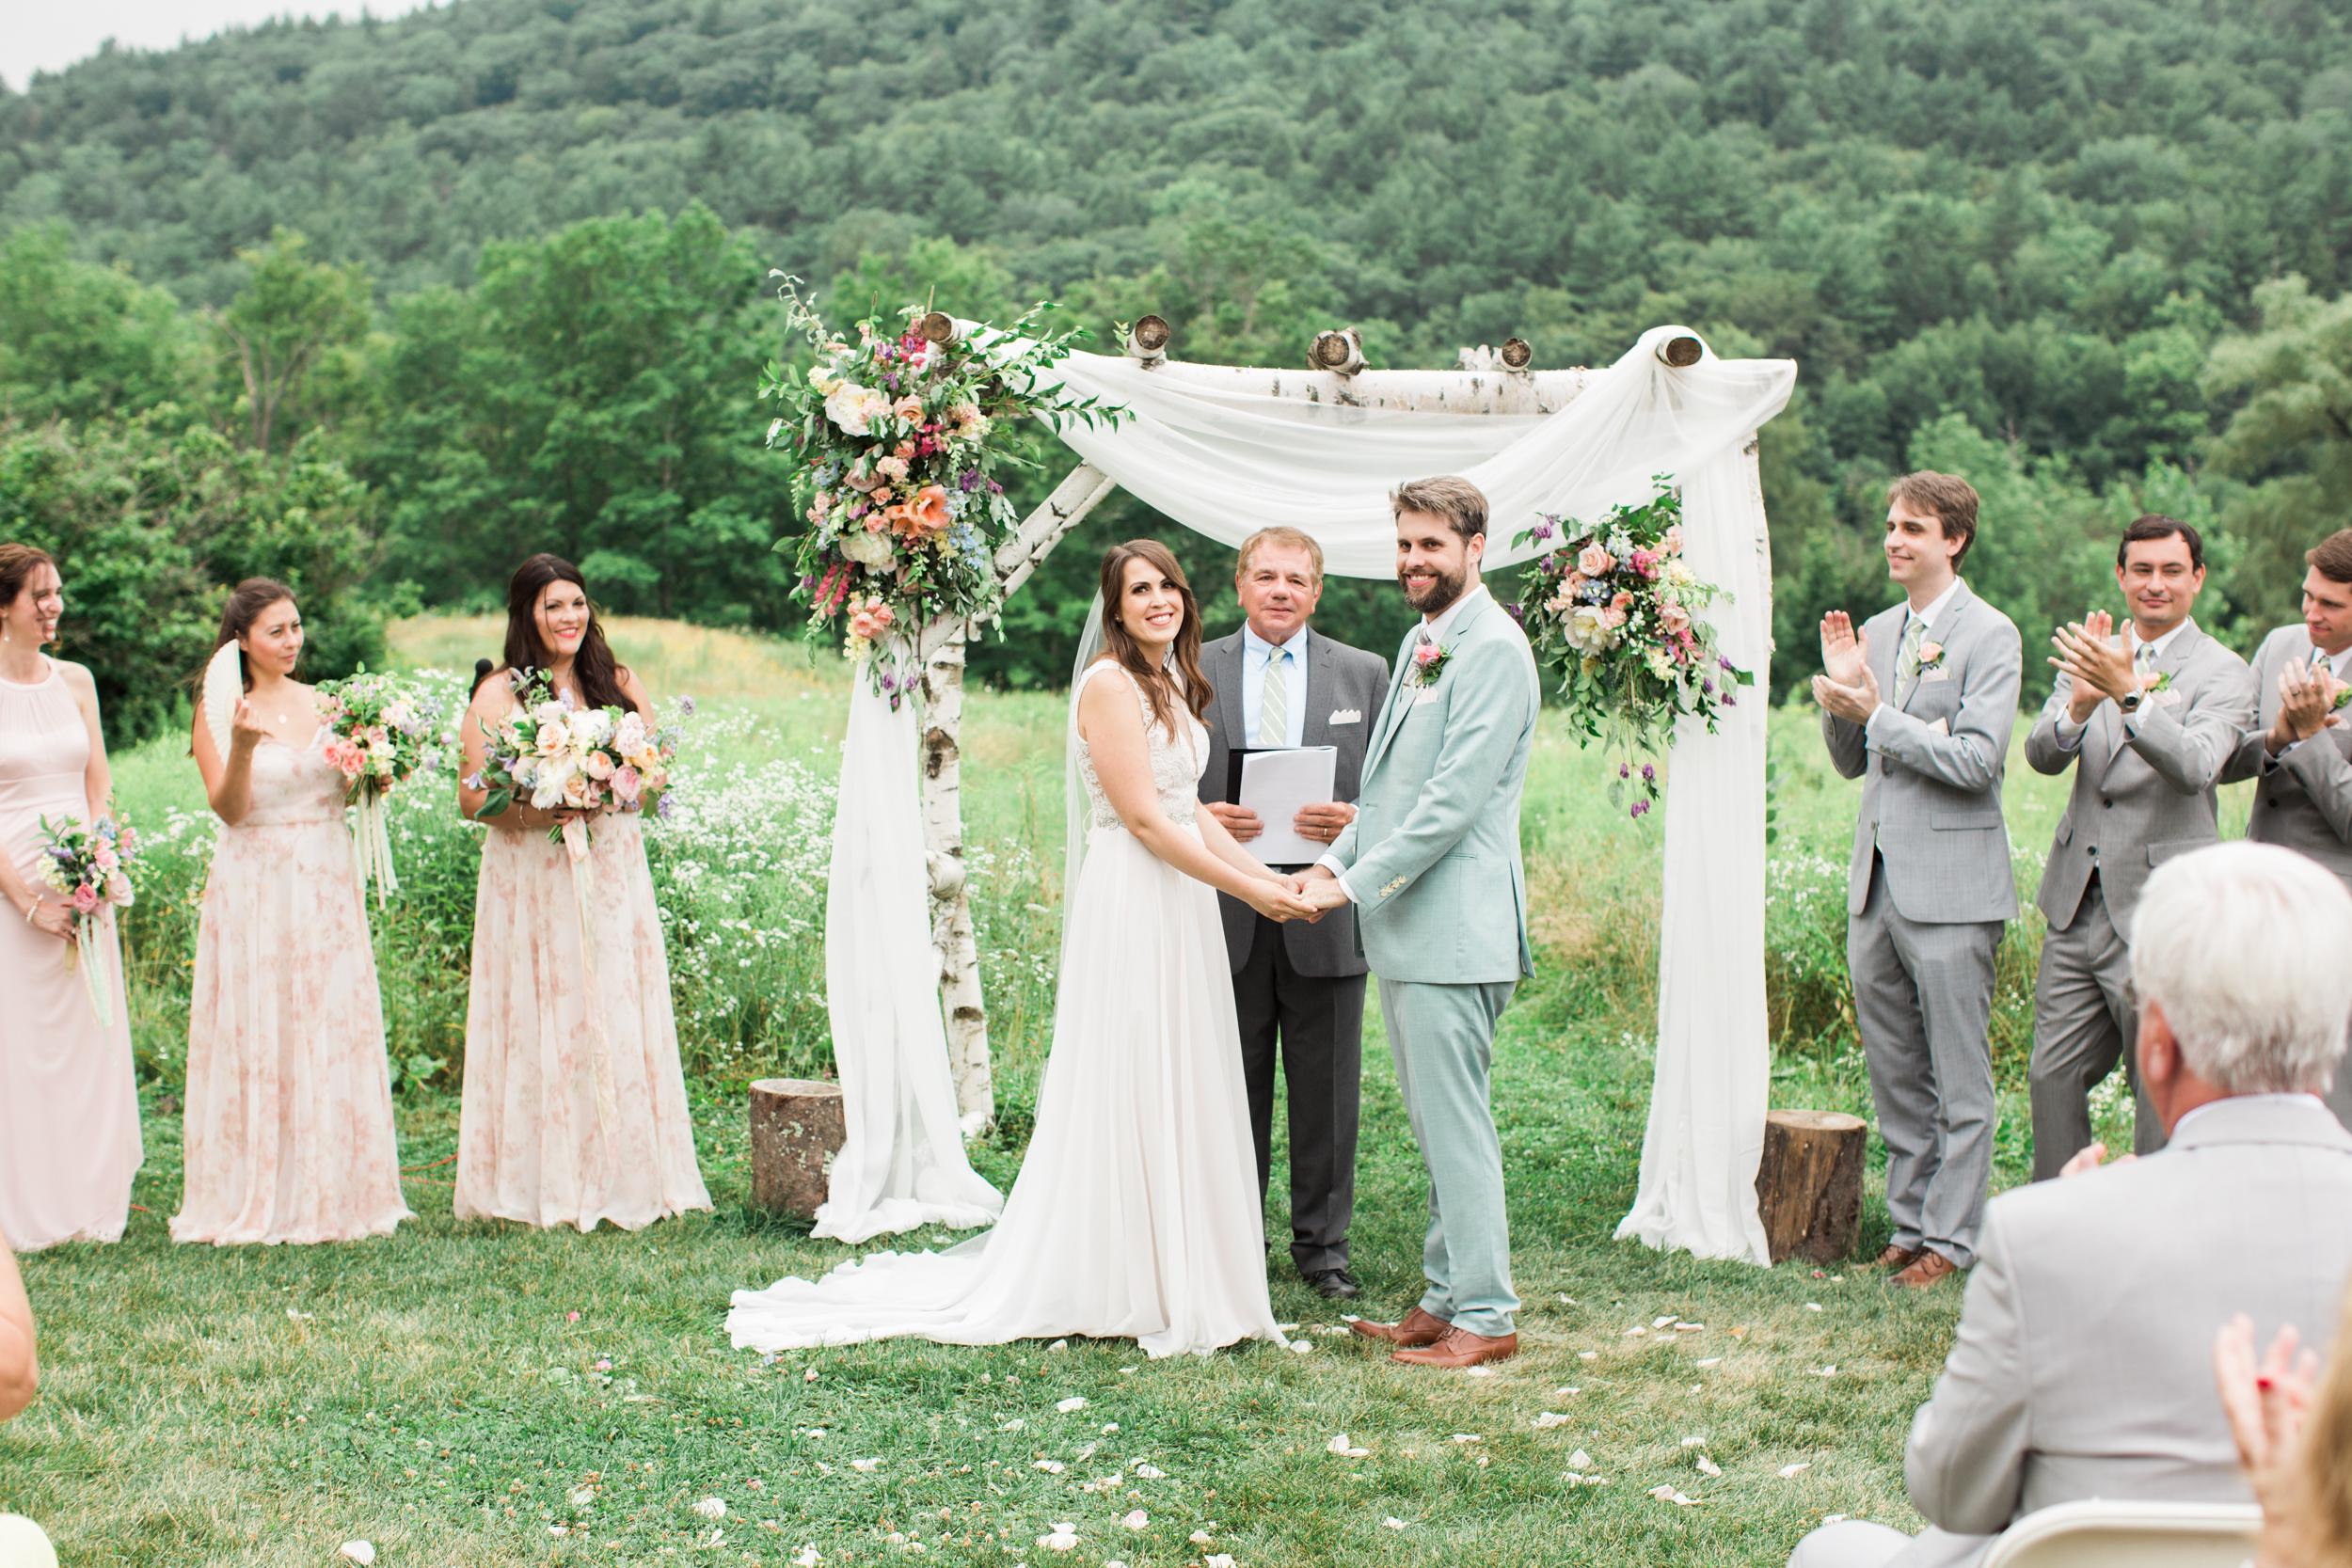 Wedding Photography in Deerfield Massachusetts